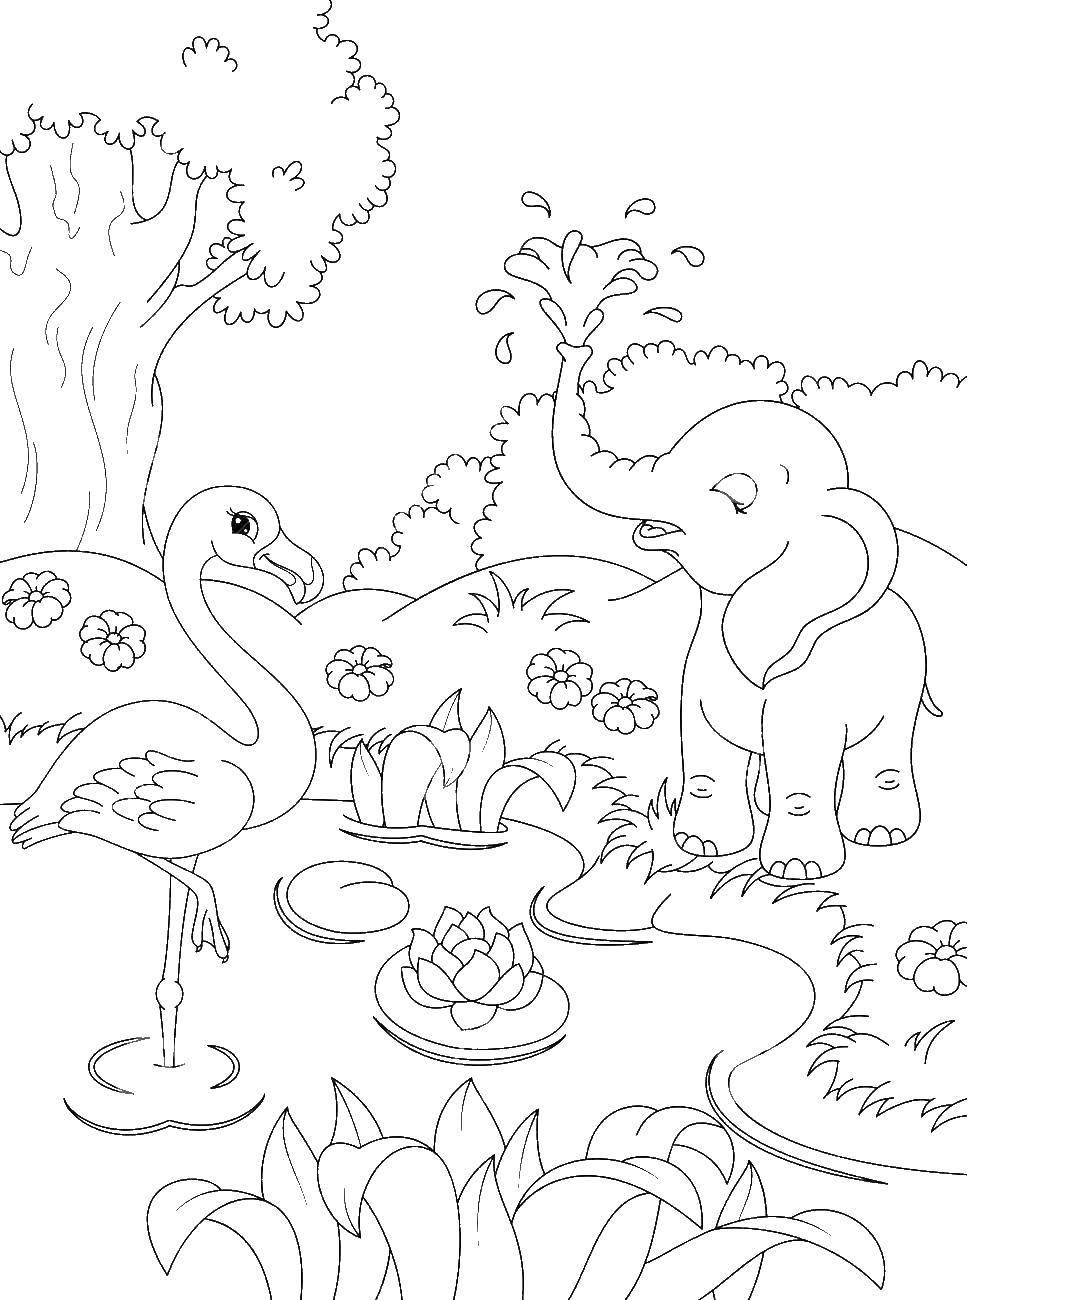 Фламинго и слон на болоте с кувшинками